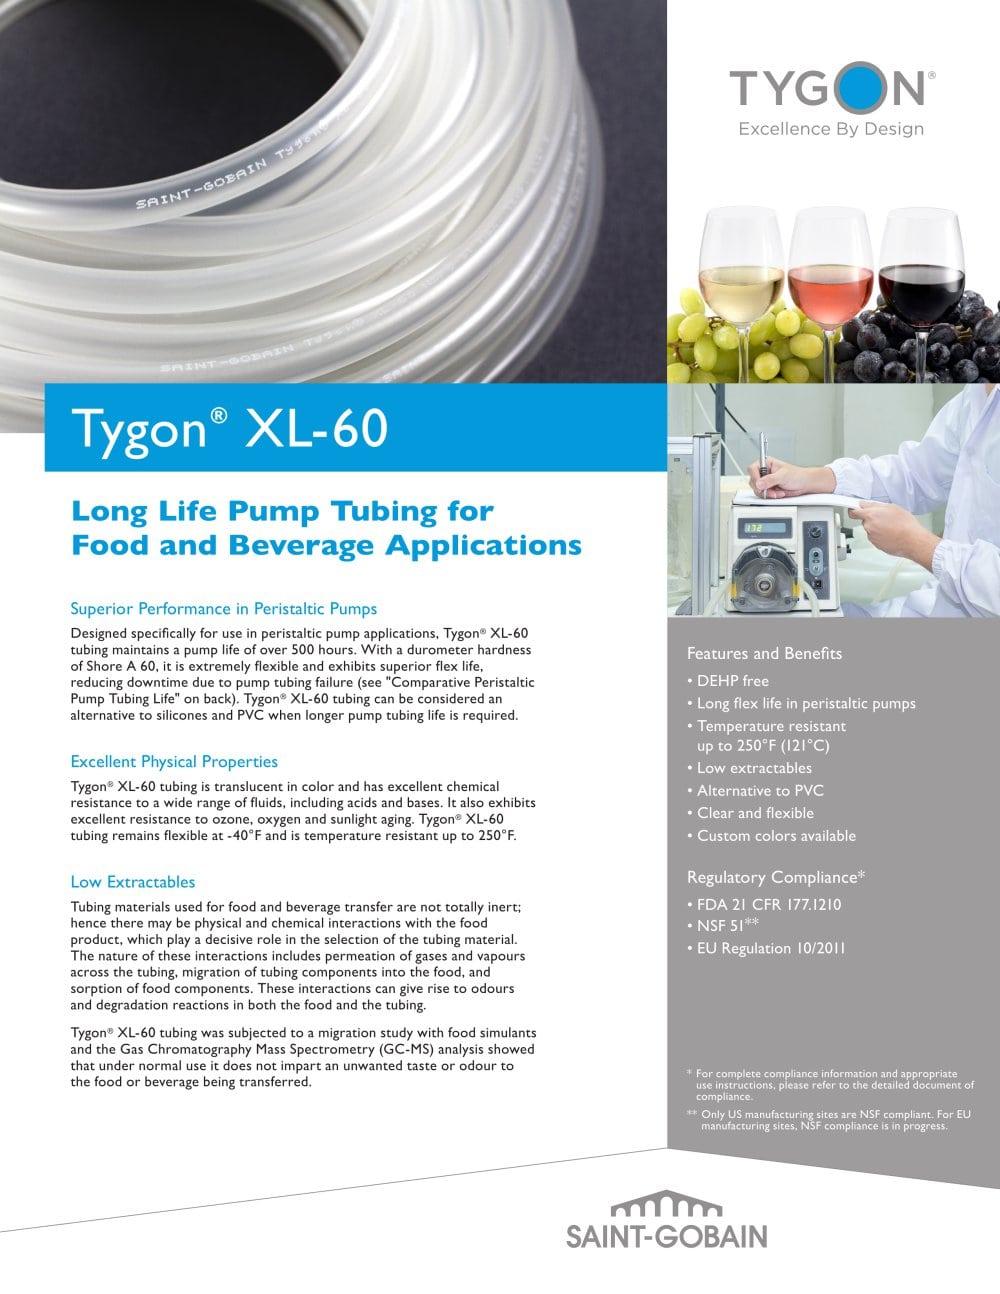 Xl 250 pdf kidsleague2018 pdf jpg tygon xl 60 1 2 pages tygon xl 60 saint gobain performance plastics process system fandeluxe Gallery